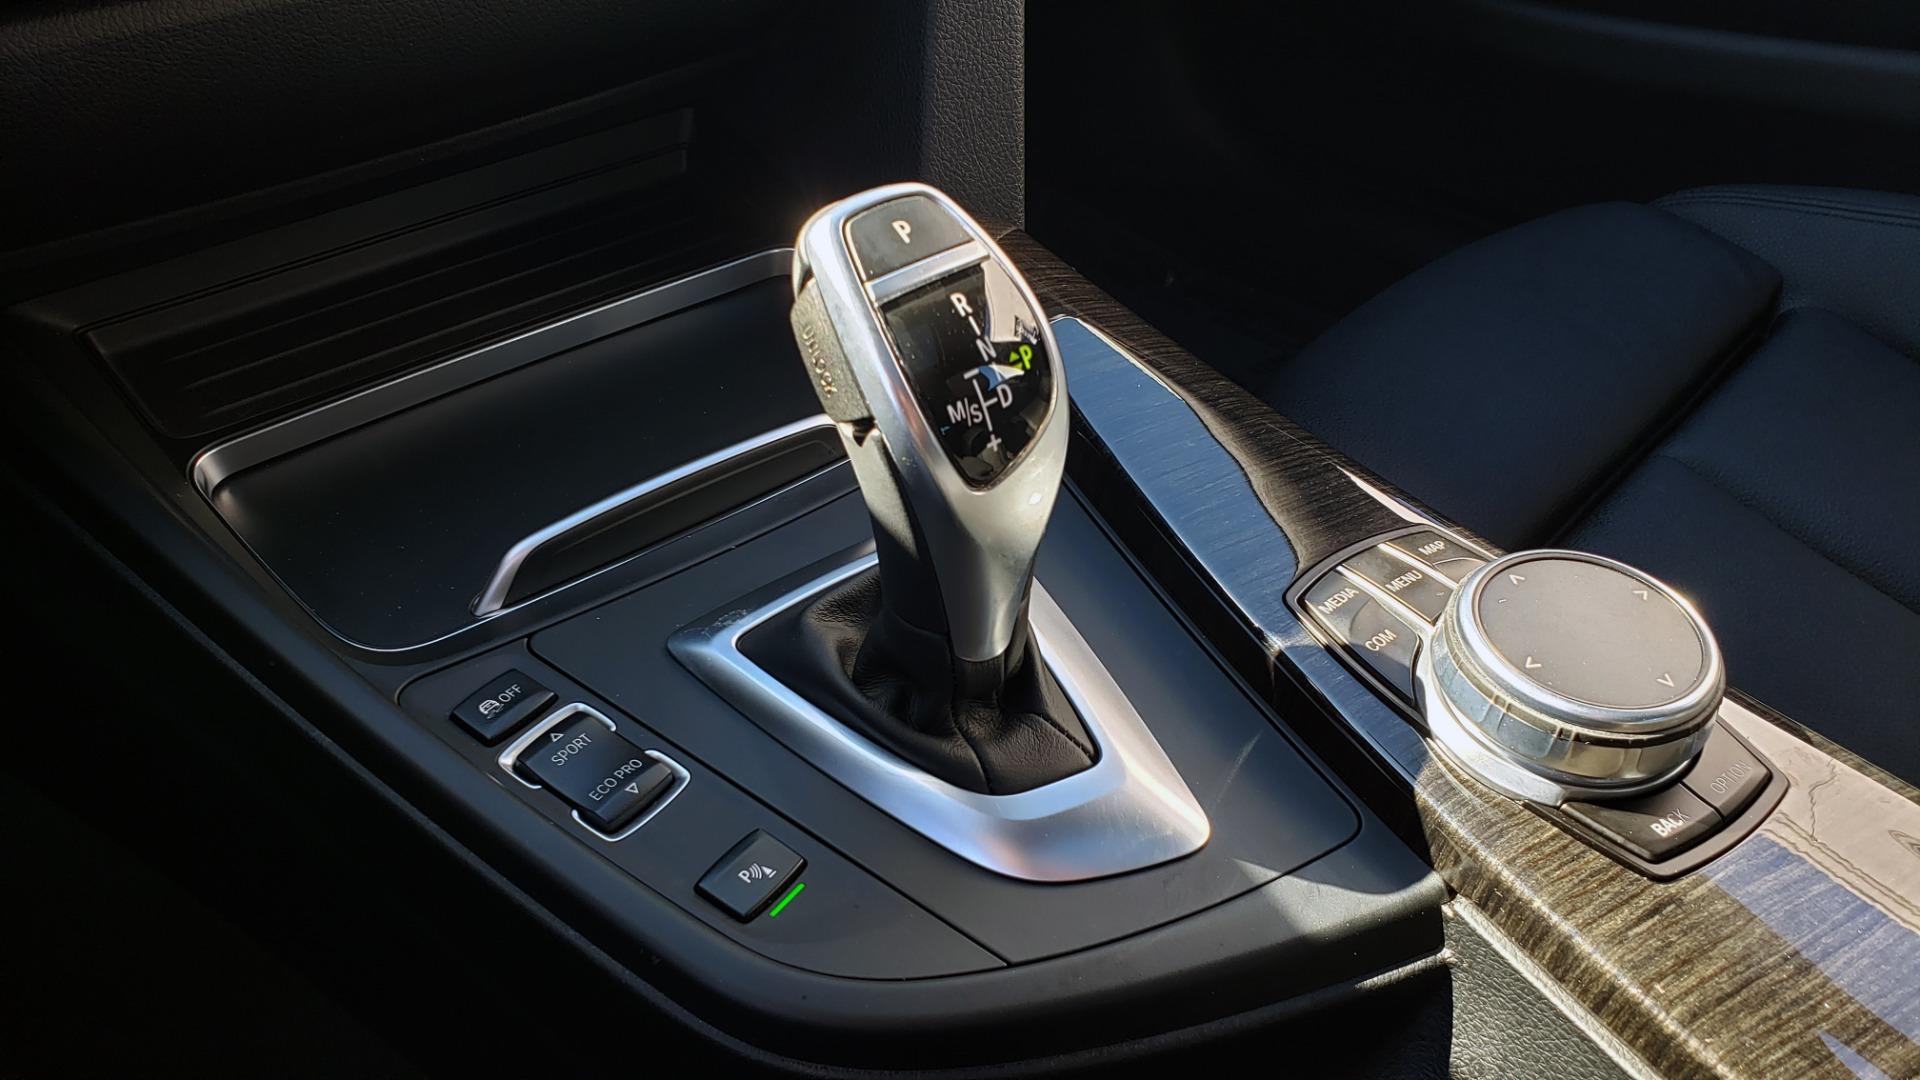 Used 2018 BMW 4 SERIES 430IXDRIVE / PREMIUM / NAV / SUNROOF / ESSENTIALS PKG for sale $28,995 at Formula Imports in Charlotte NC 28227 49